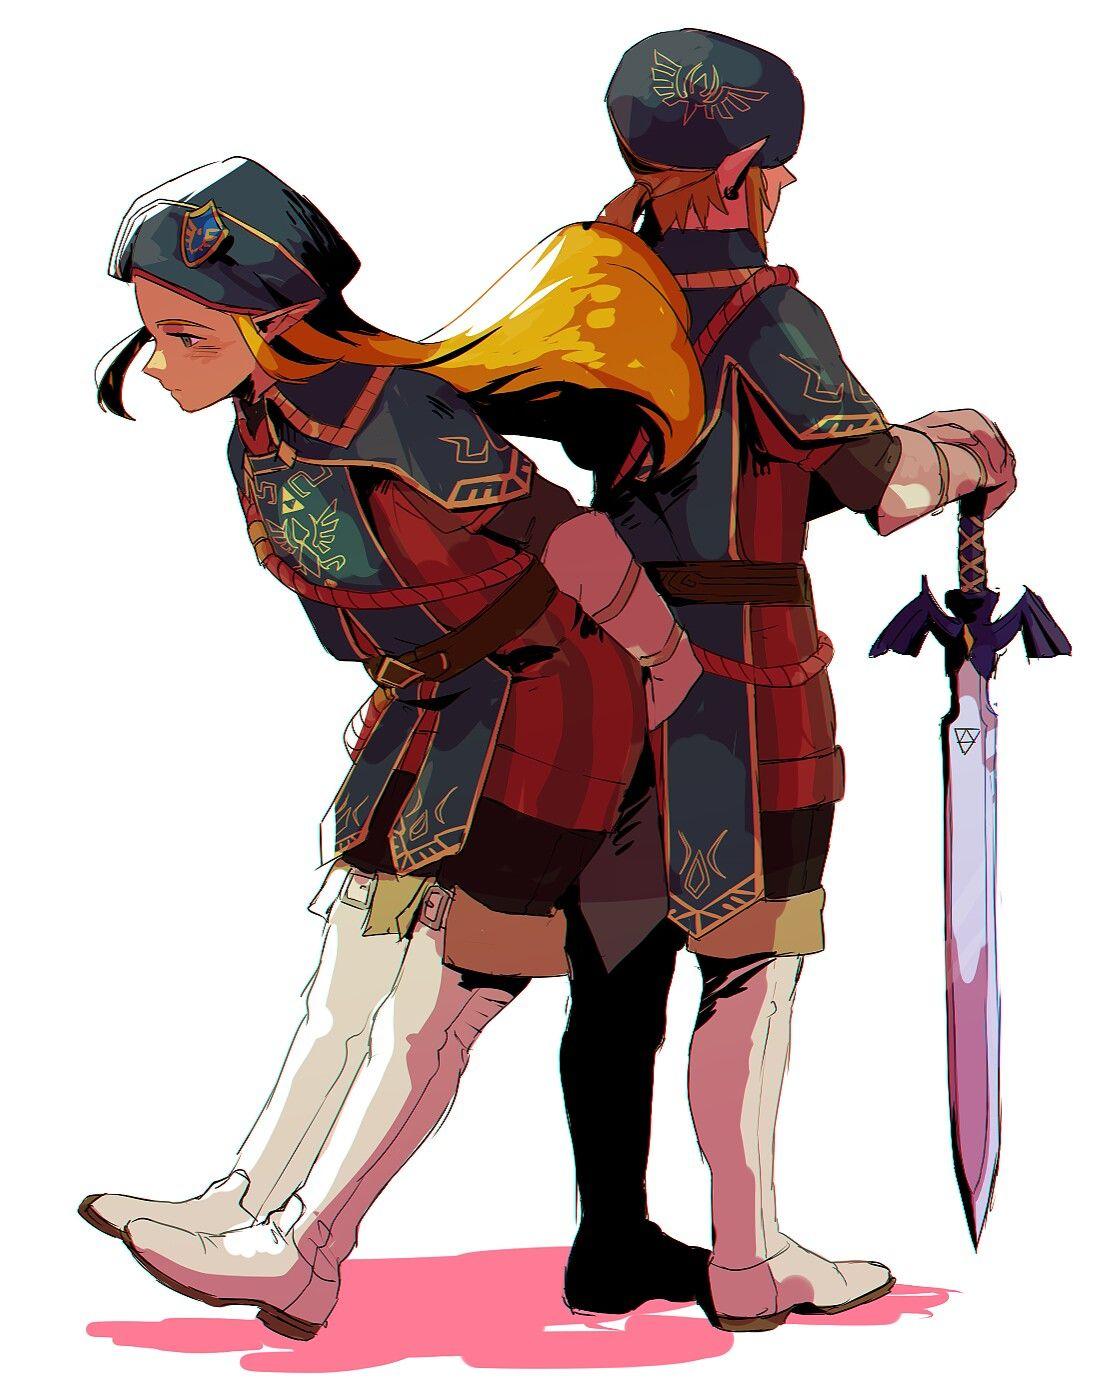 Royal Guard Link and Royal Guard Zelda | Video game stuff